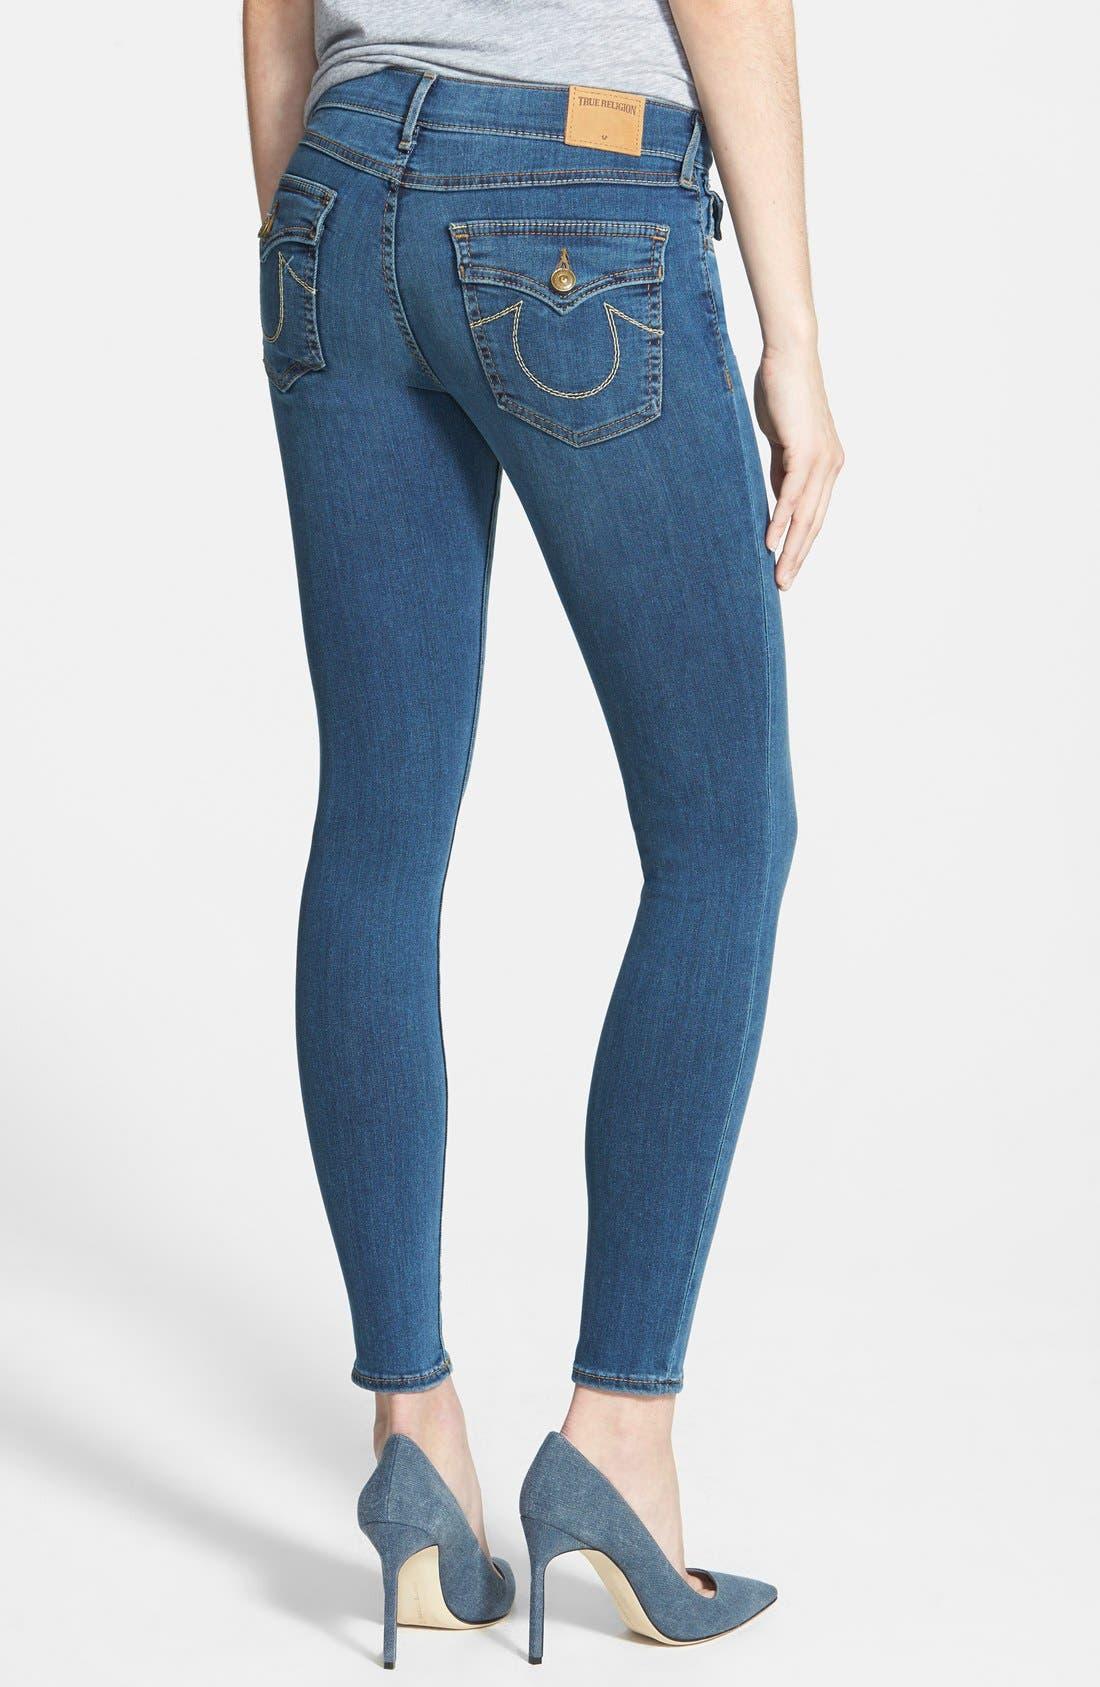 Alternate Image 2  - True Religion Brand Jeans 'Halle' Mid Rise Super Skinny Jeans (Love No Less)